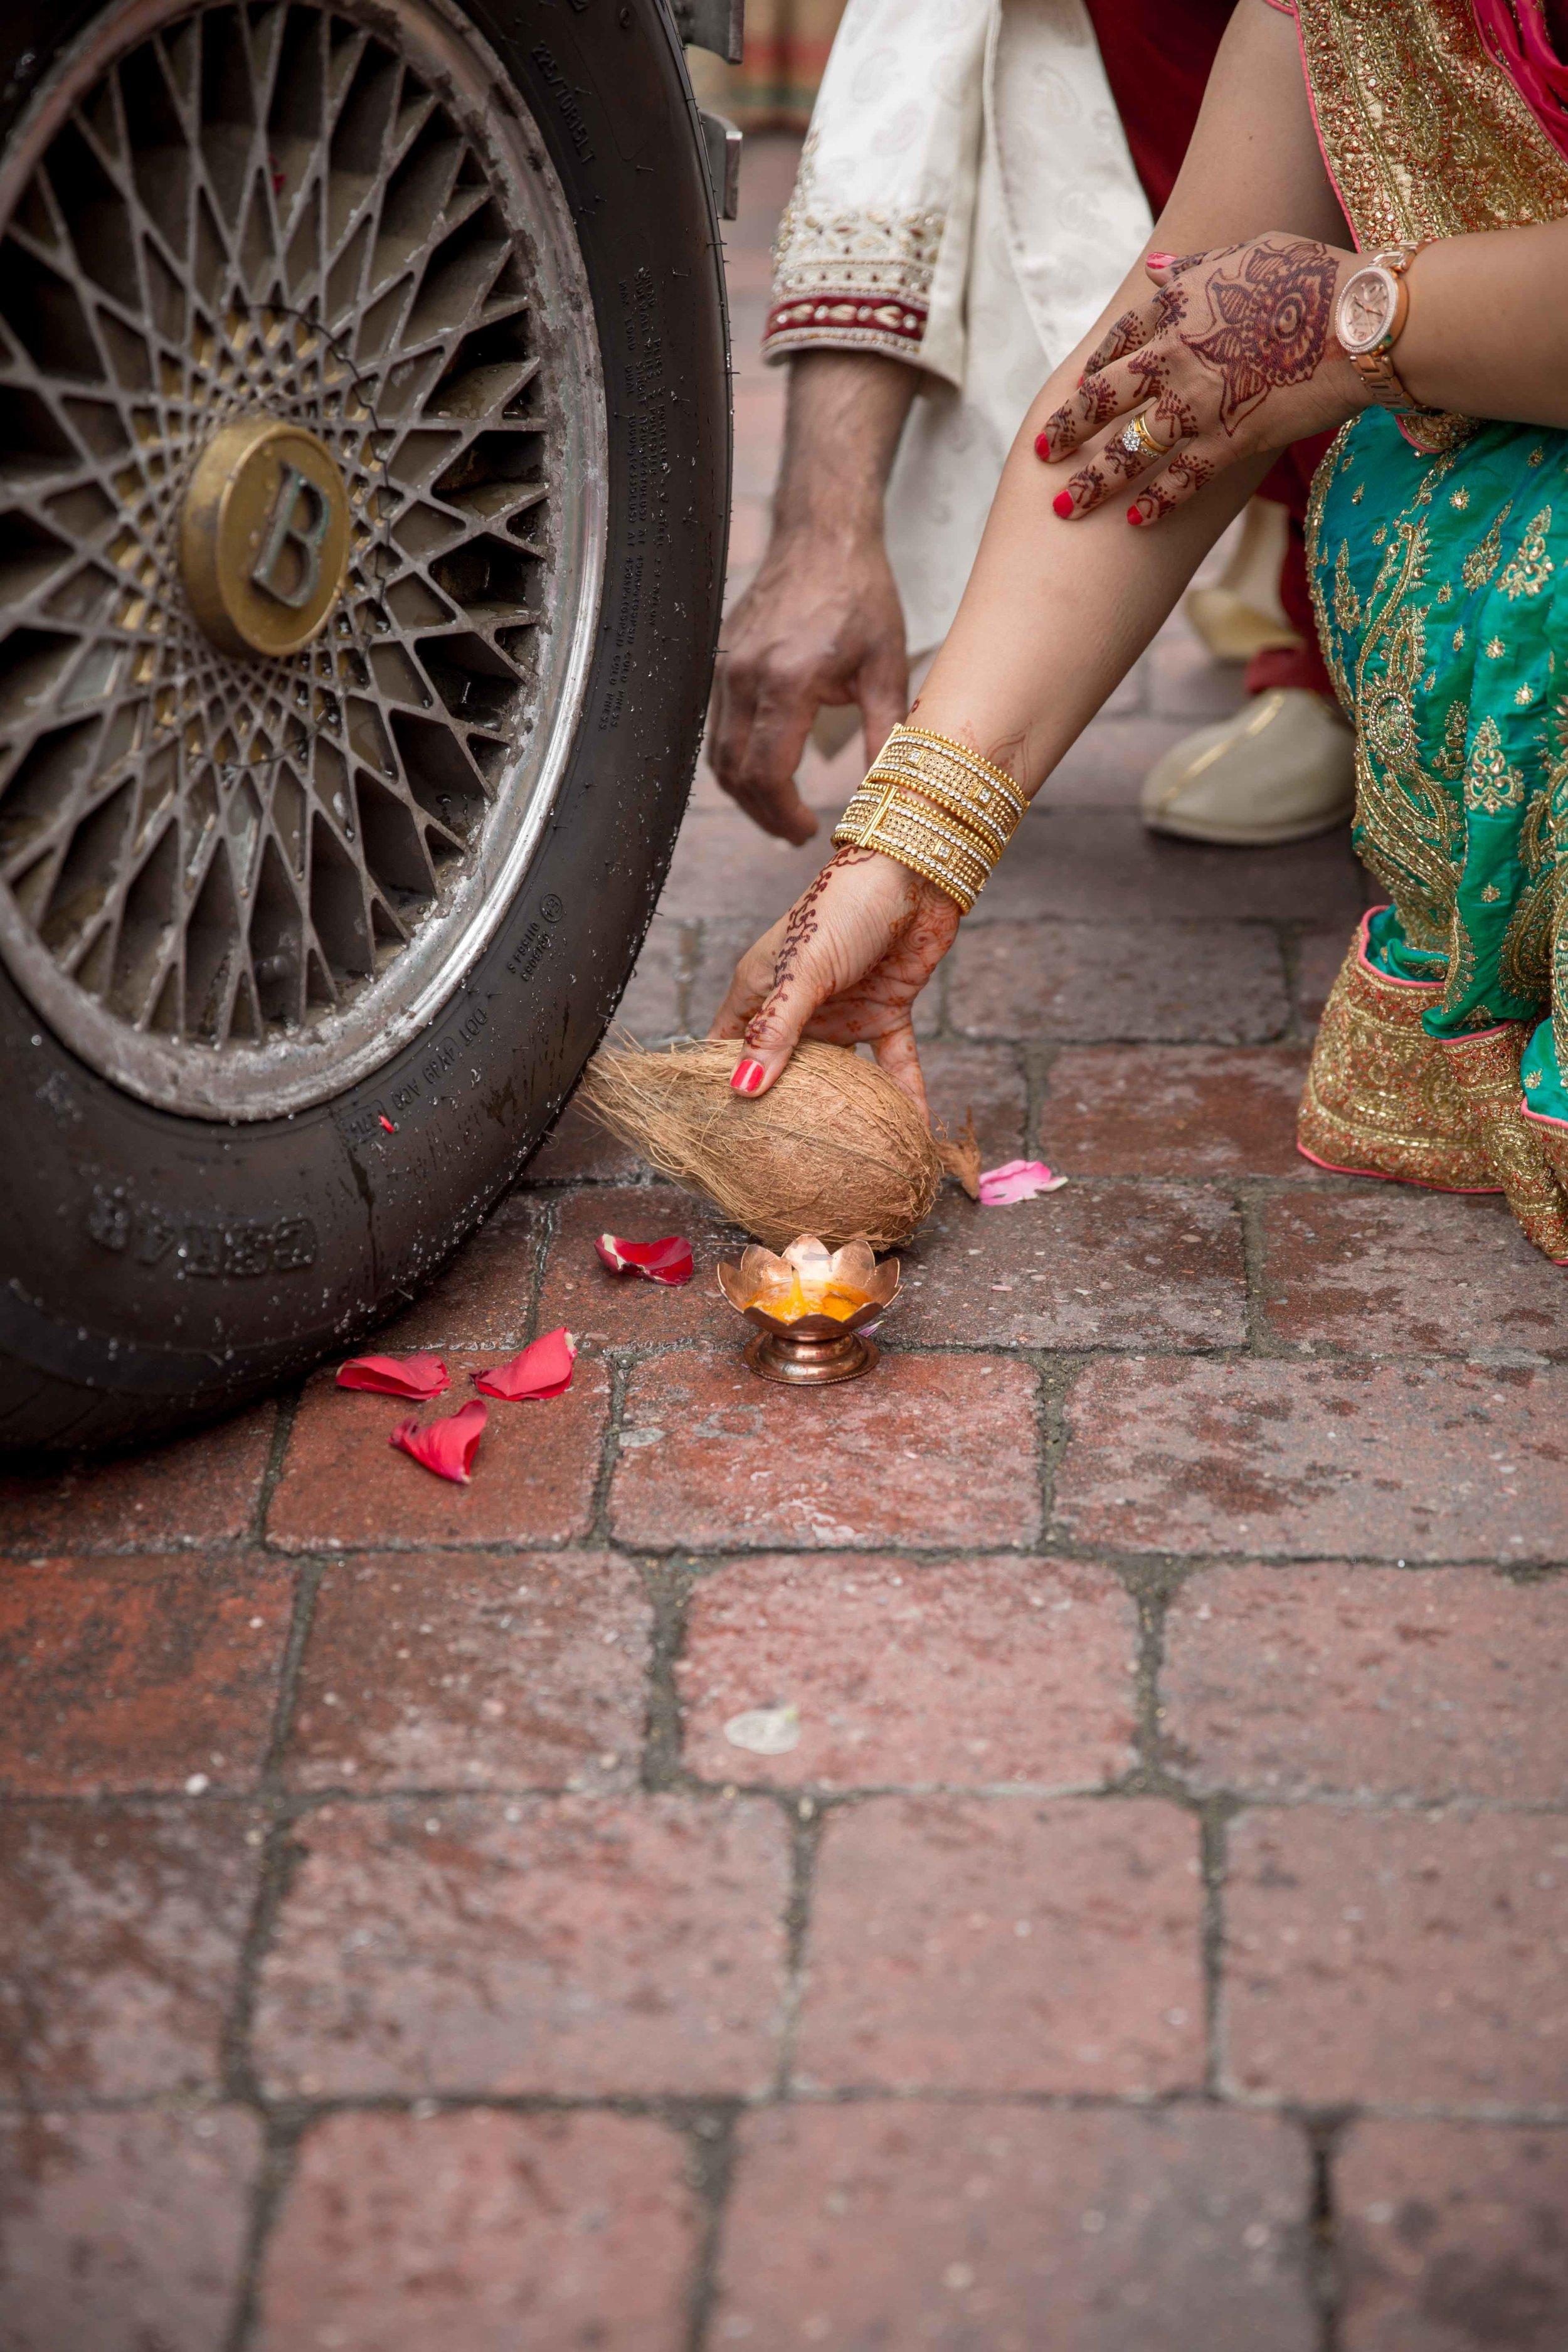 premier-banquetting-london-Hindu-asian-wedding-photographer-natalia-smith-photography-49.jpg